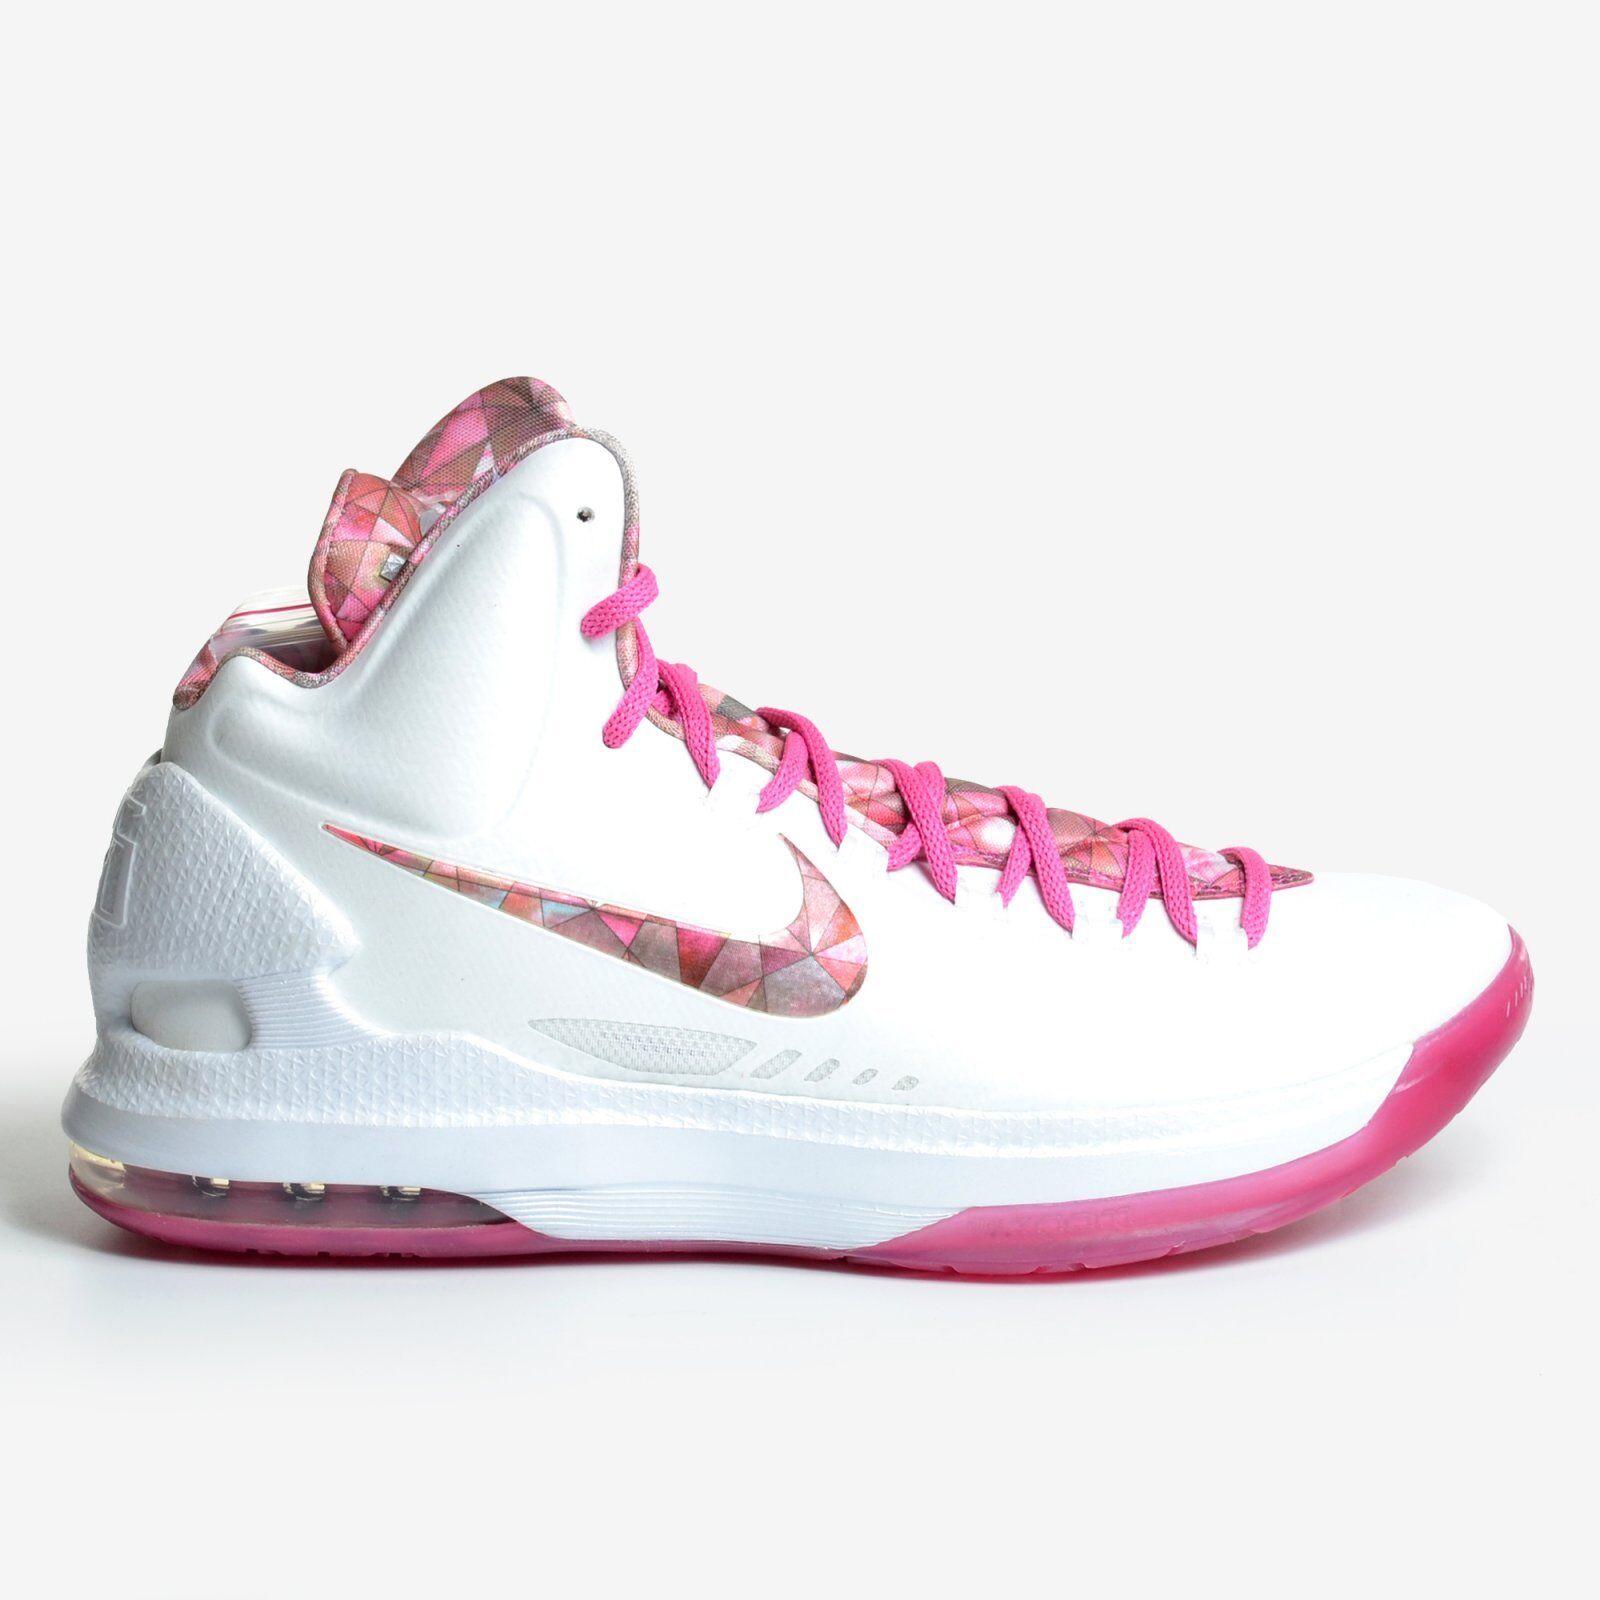 Nike KD 5 Aunt Pearl Blanco 2018 Summit Blanco Pearl Rosadofire V Basketball Rosado DS 598601-100 51f0e8